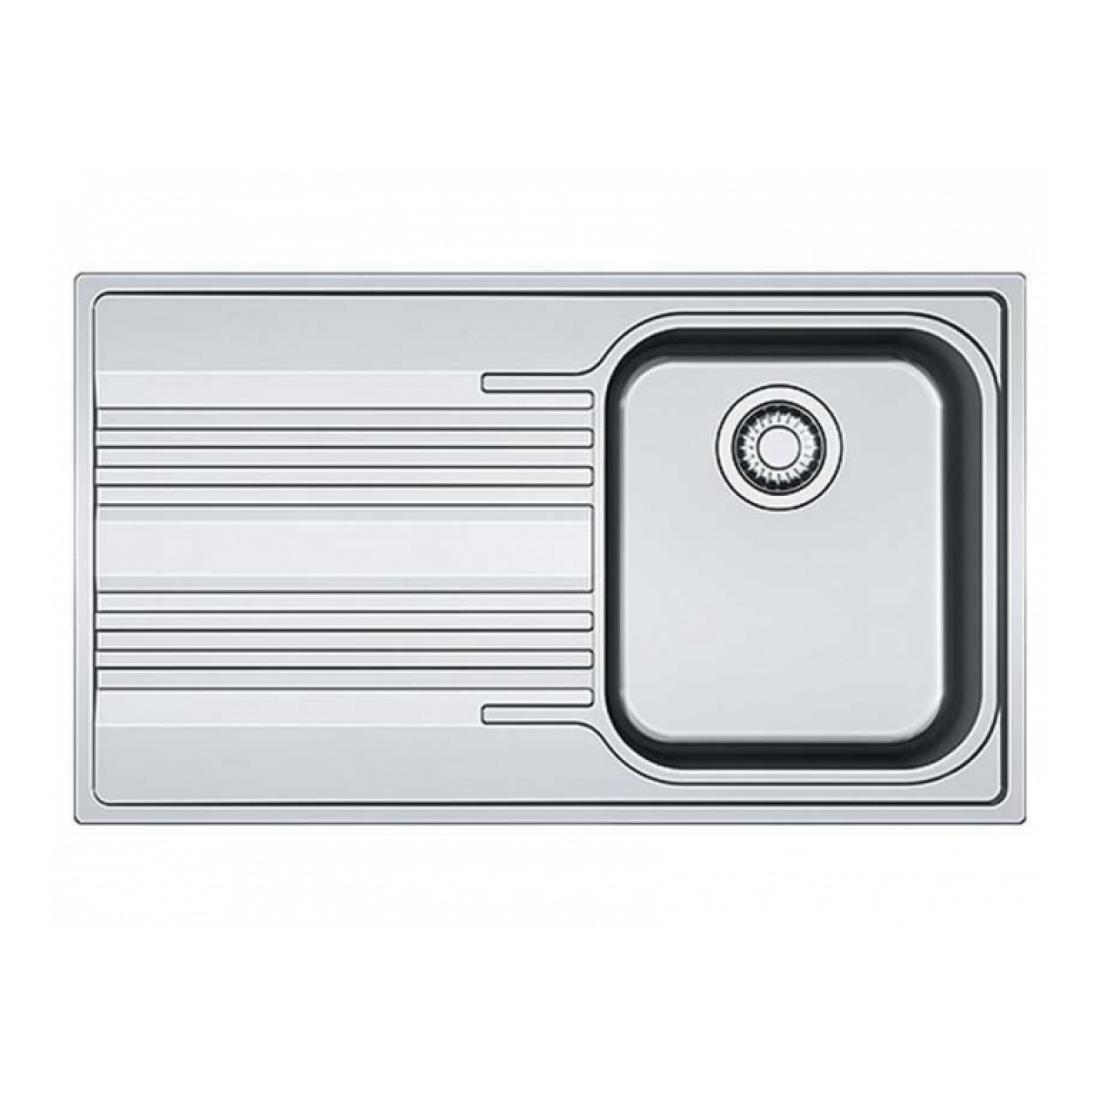 Кухонная мойка Franke Smart SRX 611-86 полированная franke npx 6113 полированная сталь